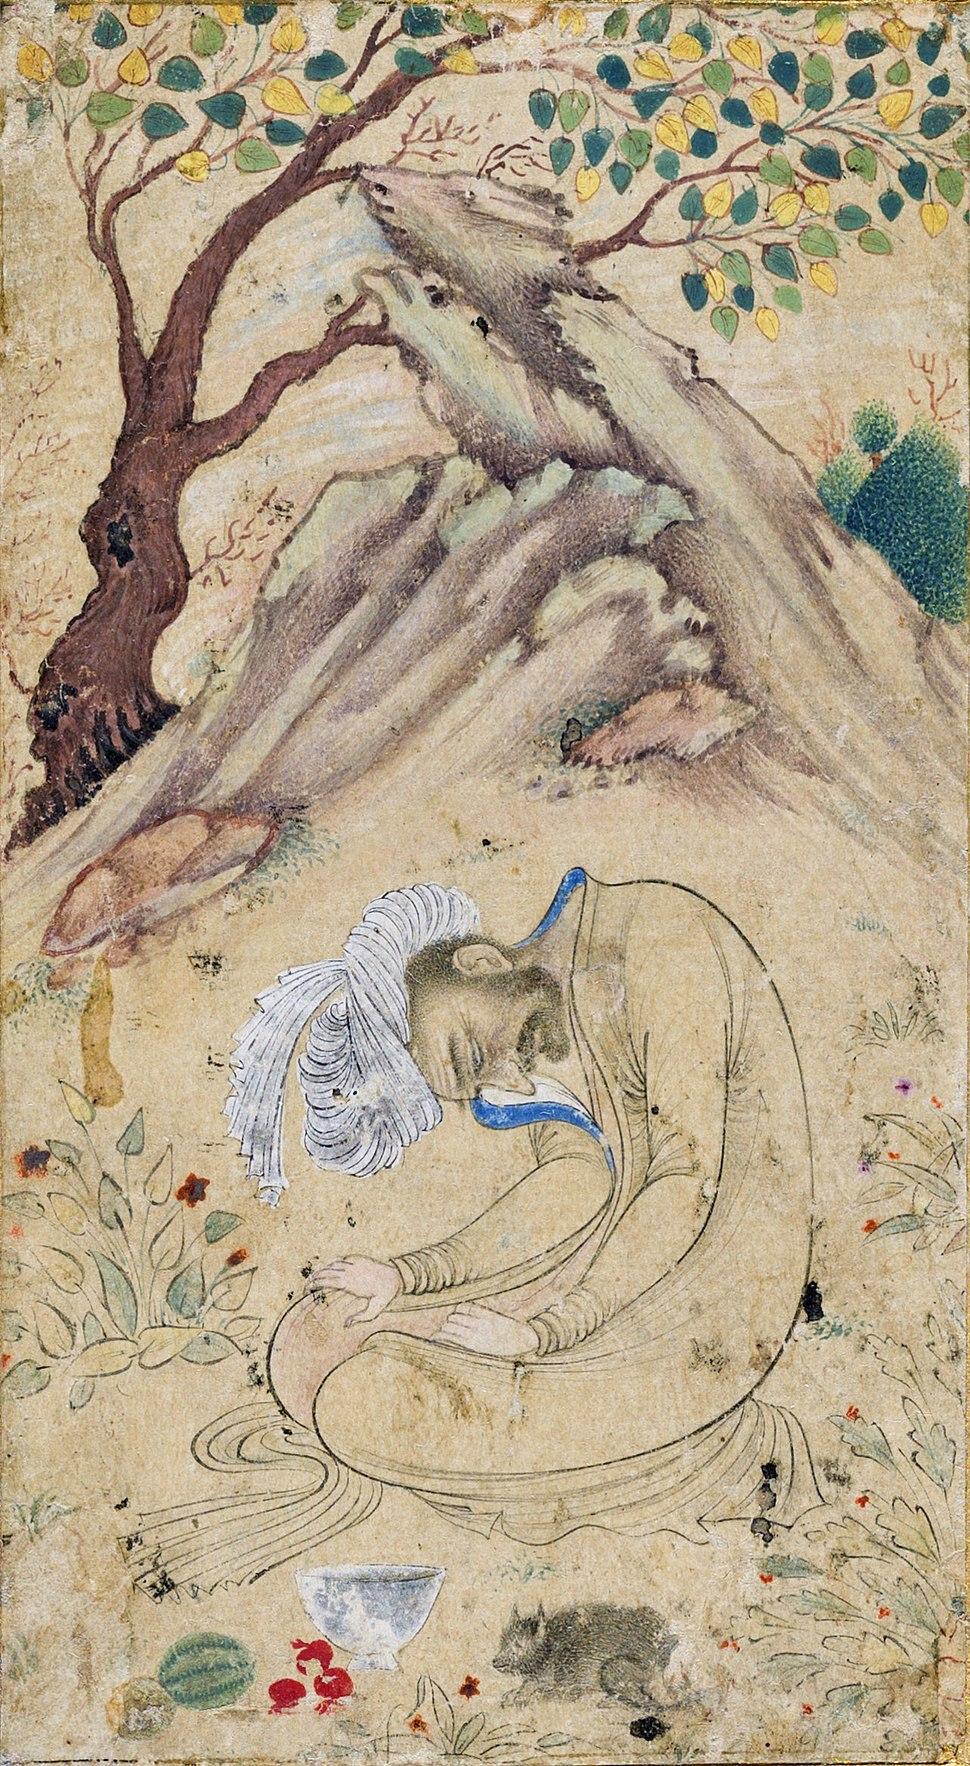 A Sufi in Ecstasy in a Landscape LACMA M.73.5.582